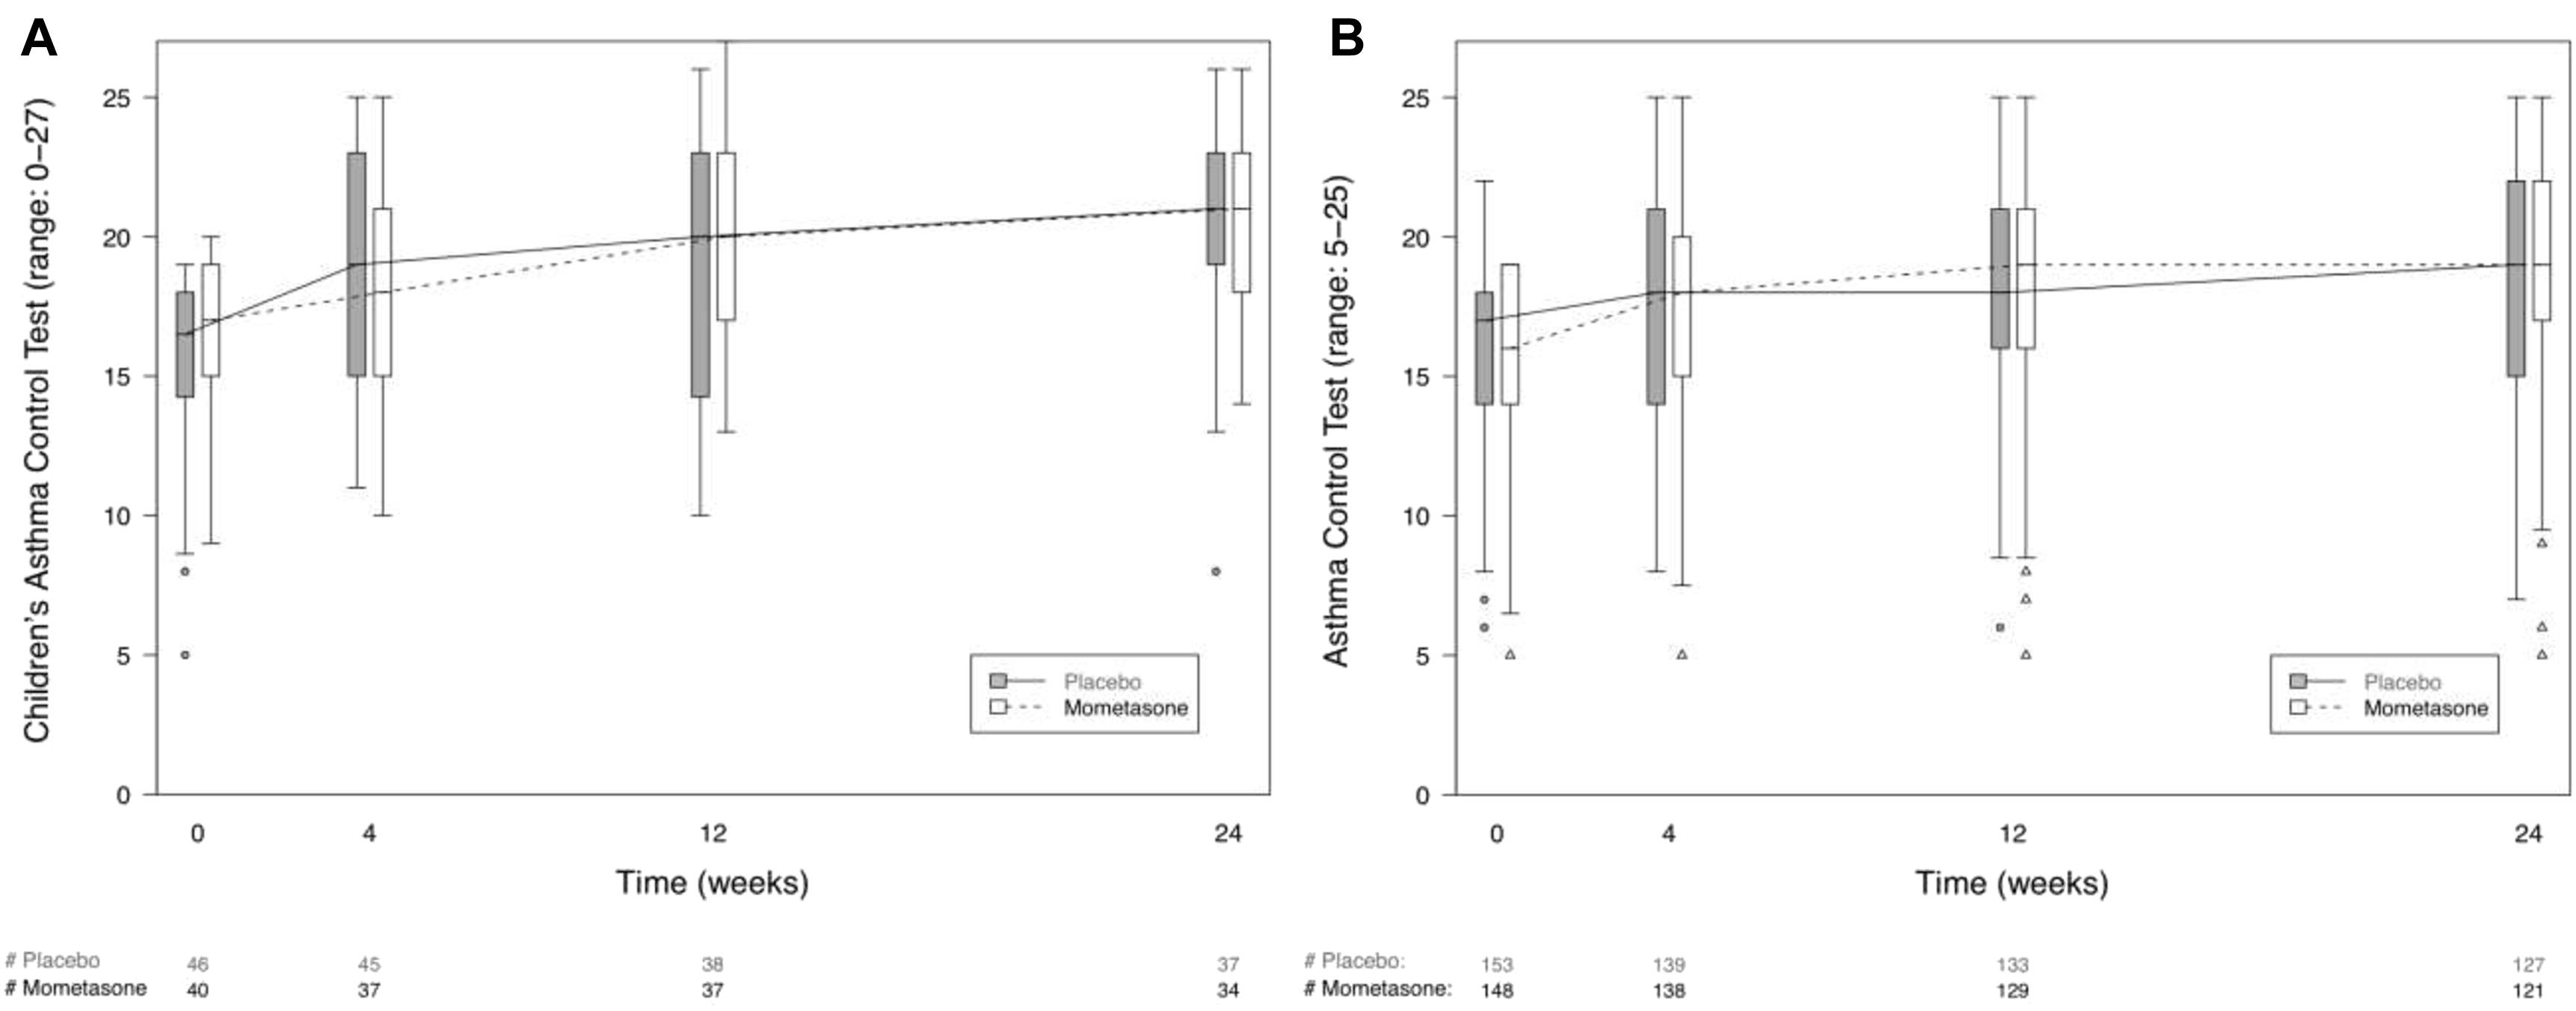 Efficacy of nasal mometasone for the treatment of chronic